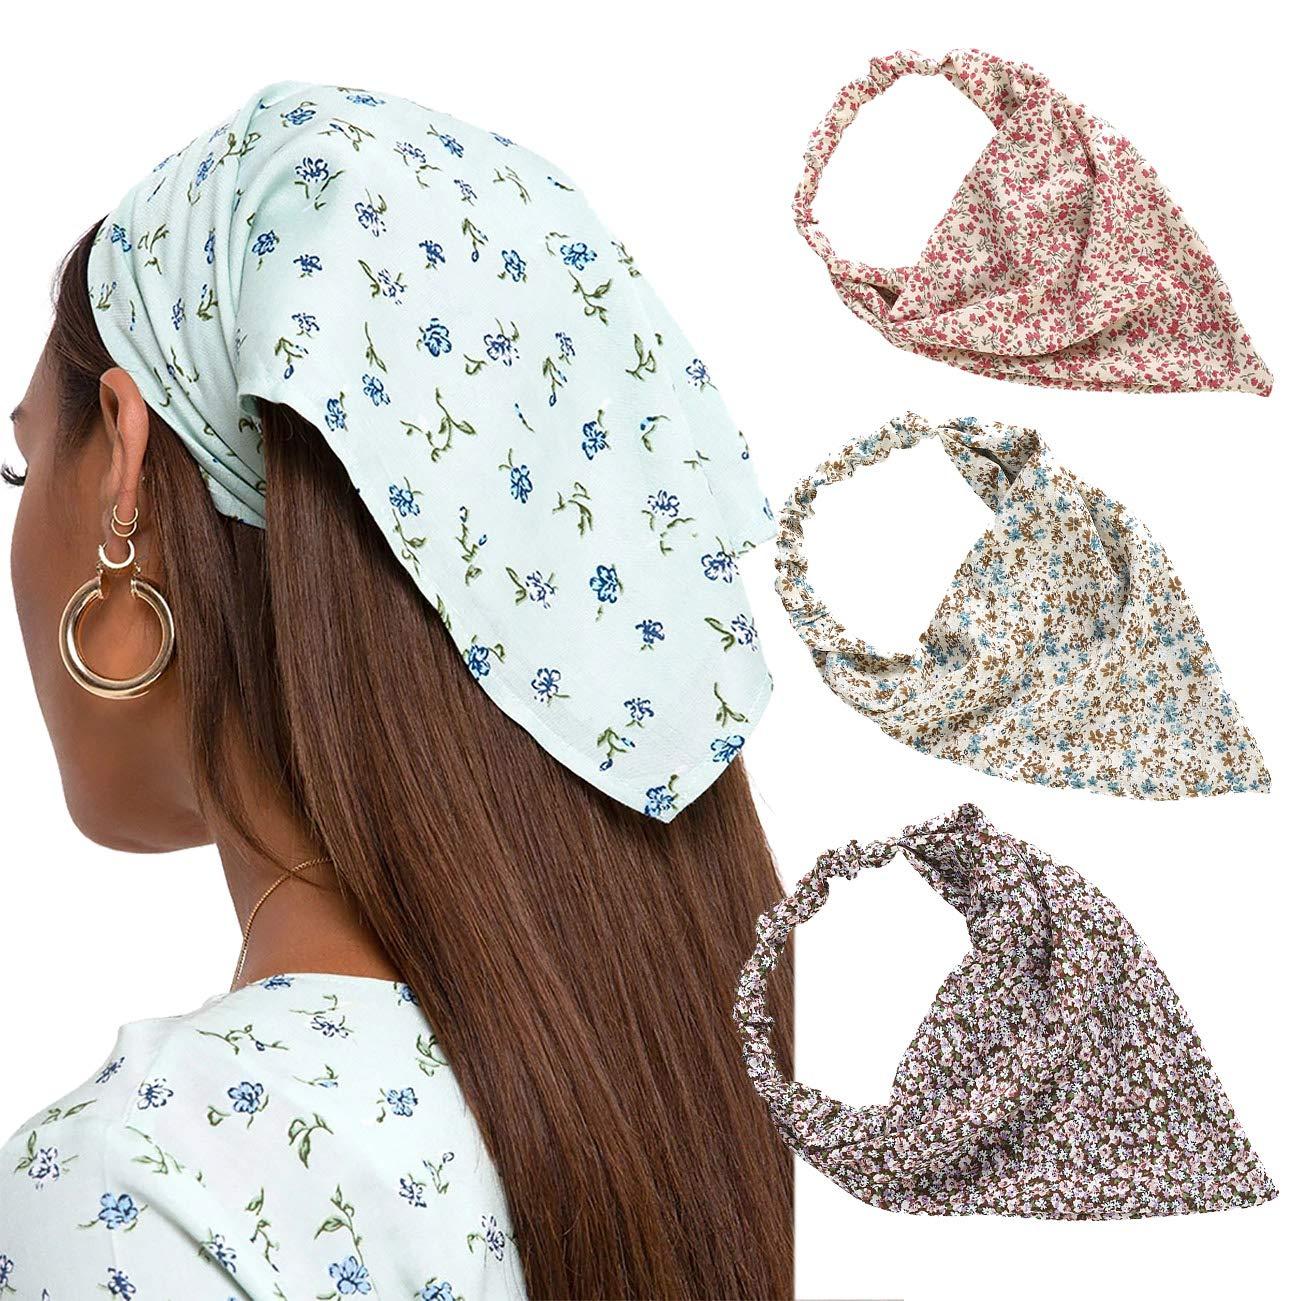 Amazon.com : Floral Elastic Hair Scarf Headband - 3 PCS Chiffon Head  Kerchief Headband Print Floral Hair Scarves with Hair Clips Kerchief Head  Scarf Hair Bandanas for Women (Pink/Beige/Red) : Beauty